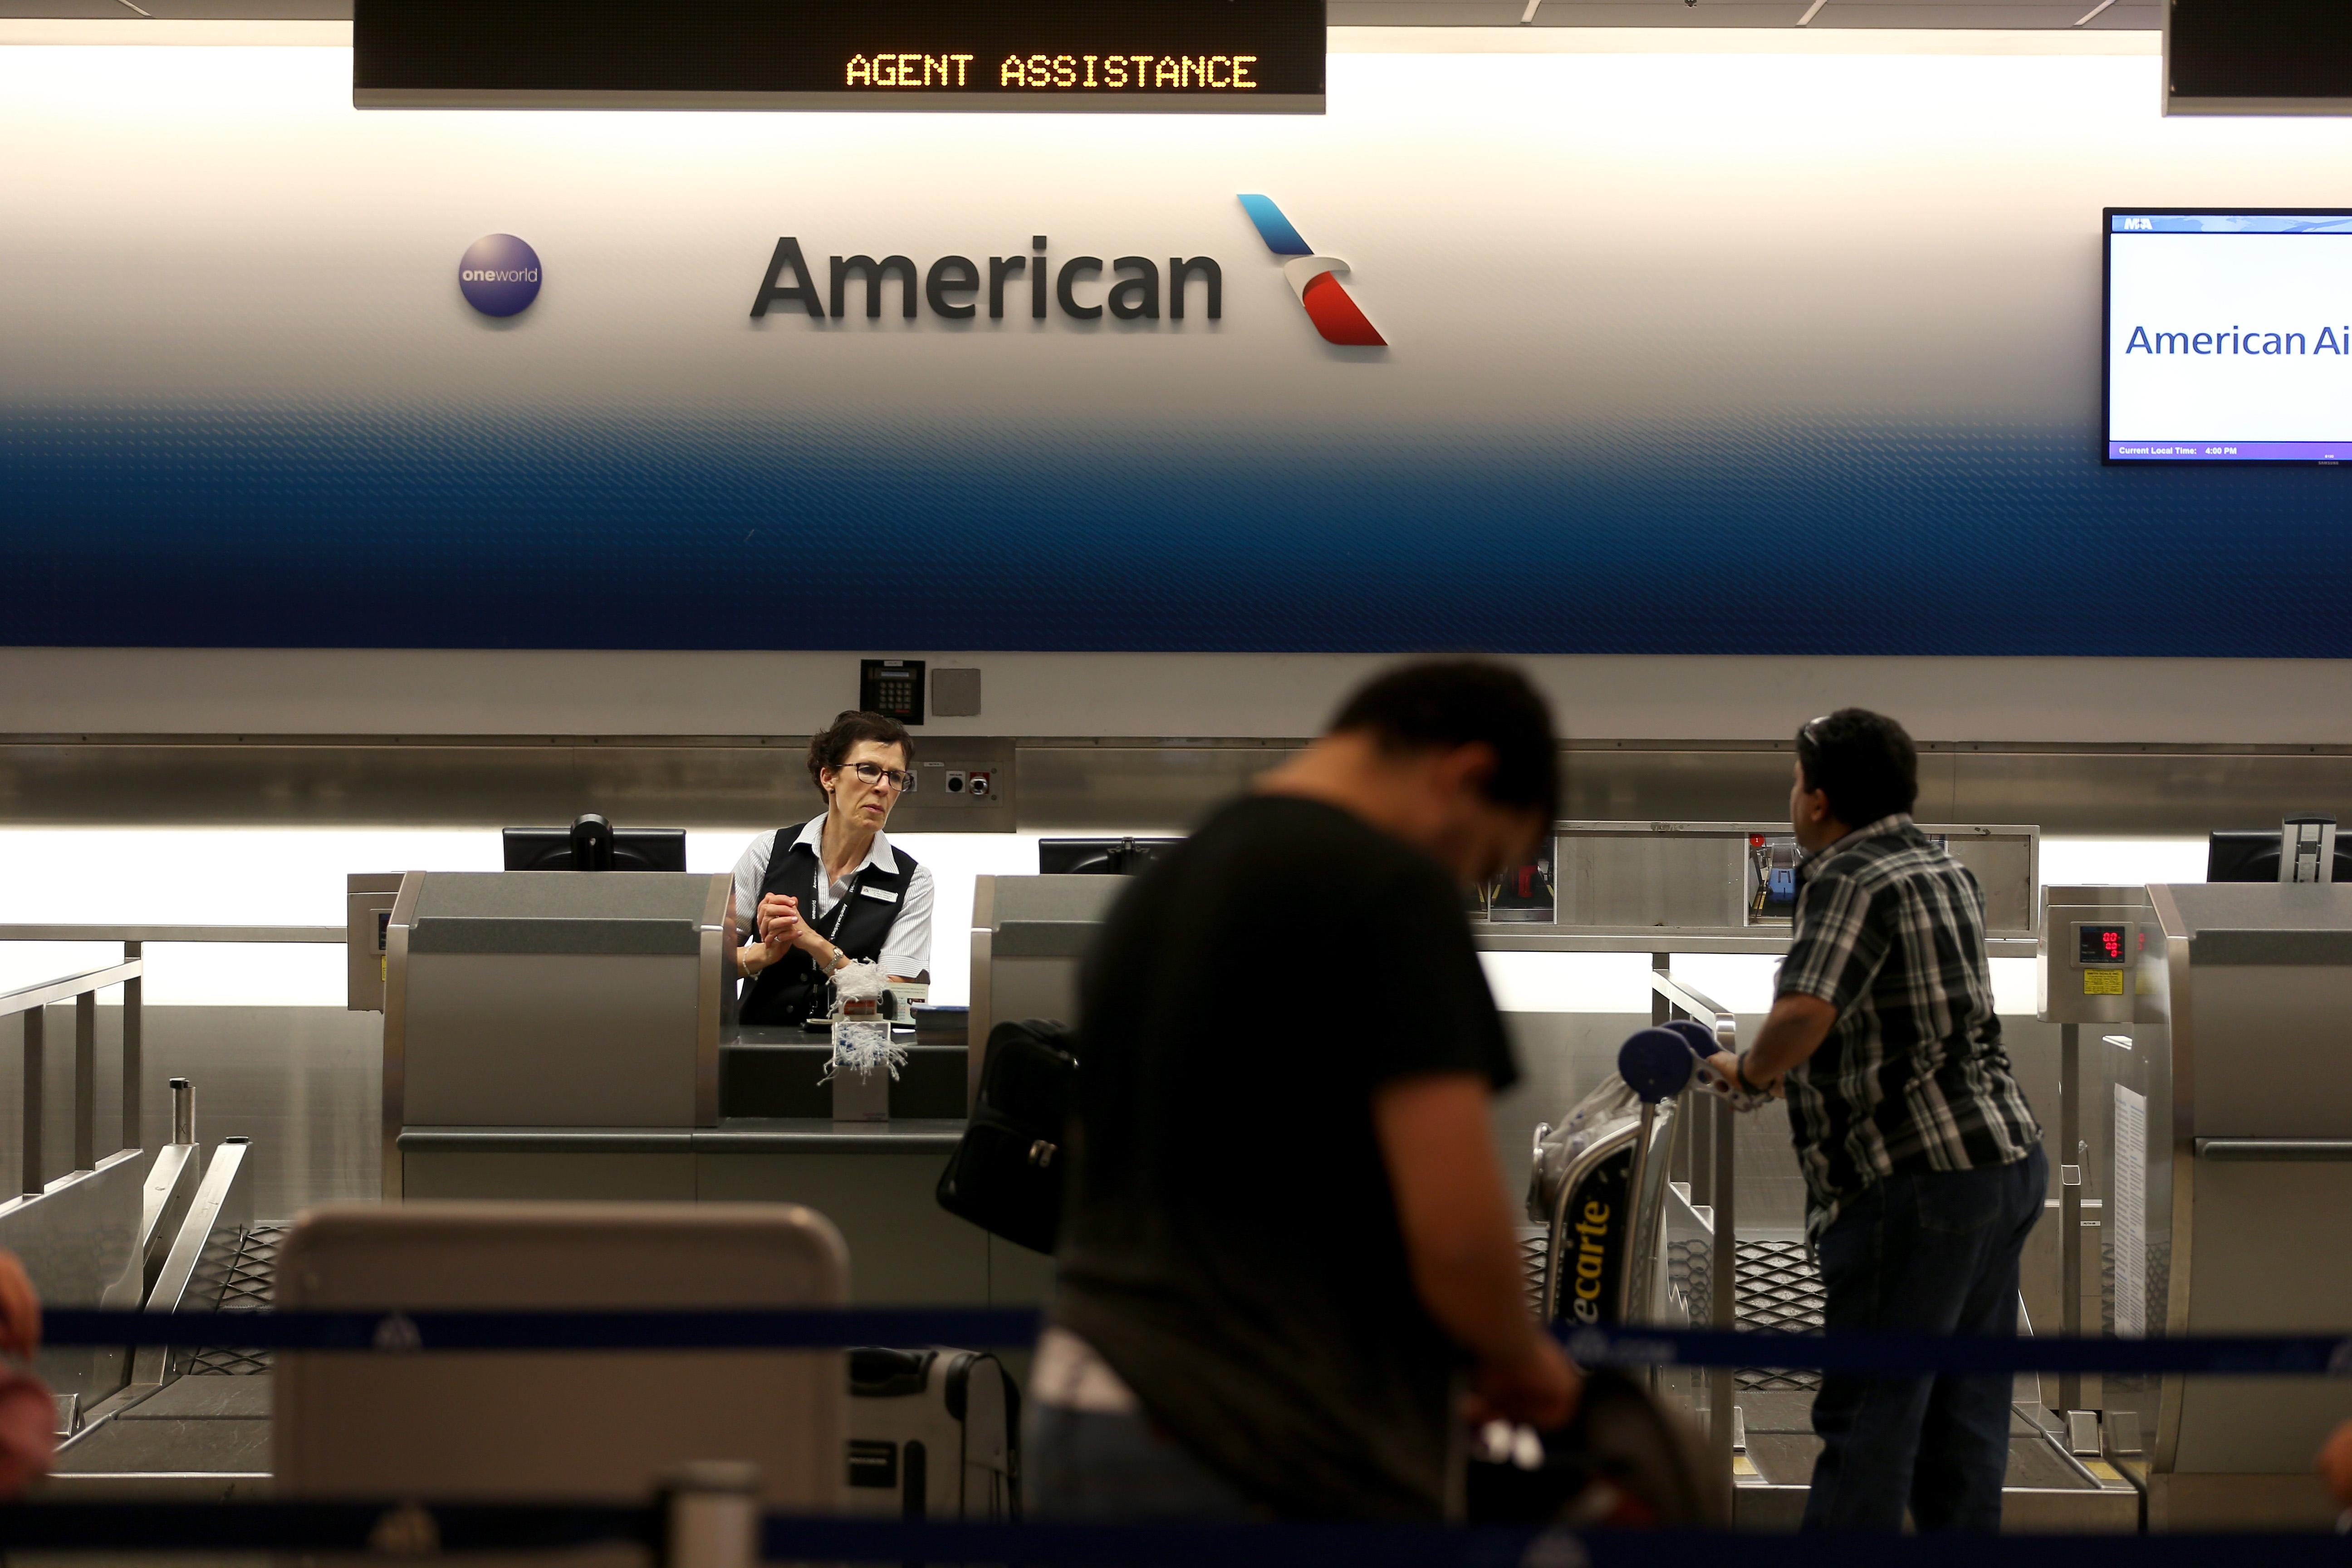 Northeast Blizzard Causes Flight Delays Across The U.S.